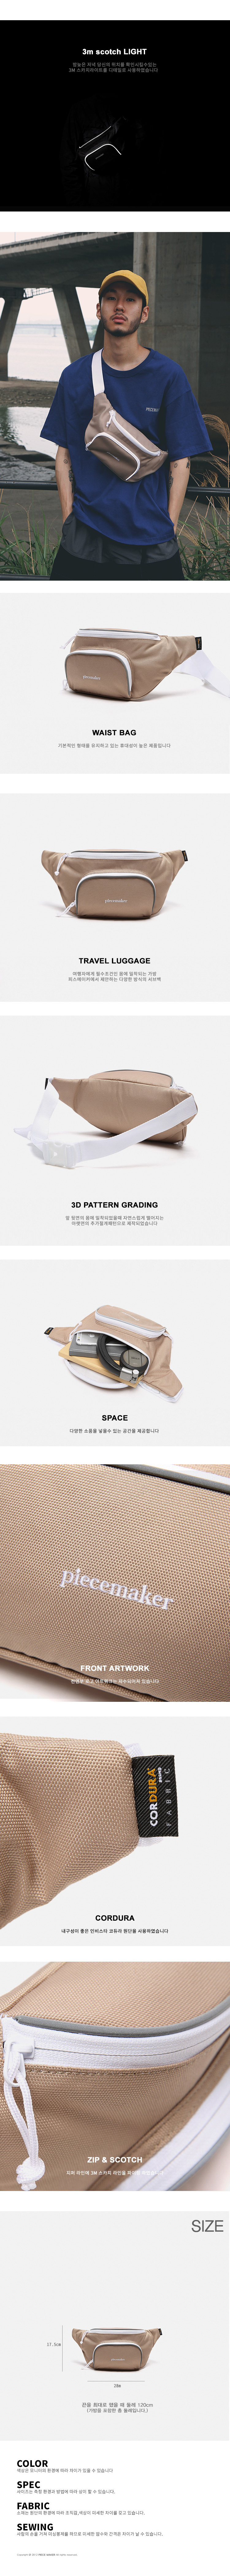 CLASSIC CORDURA WAIST BAG (CARAMEL) - 피스메이커, 32,000원, 힙색, 패브릭힙색